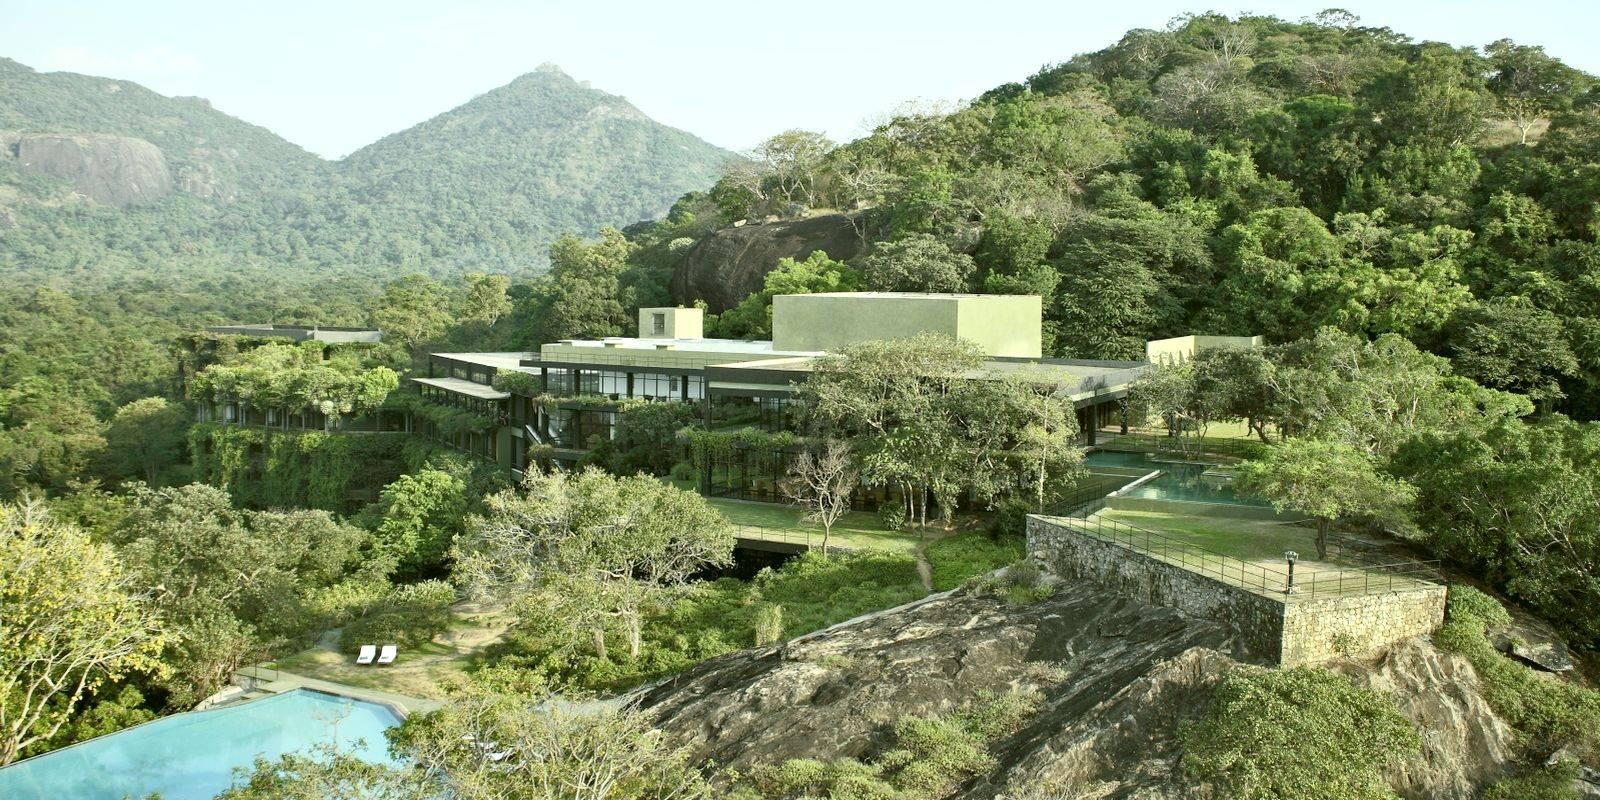 Пример концепции критического регионализма - отель Кандалама на Шри-Ланке